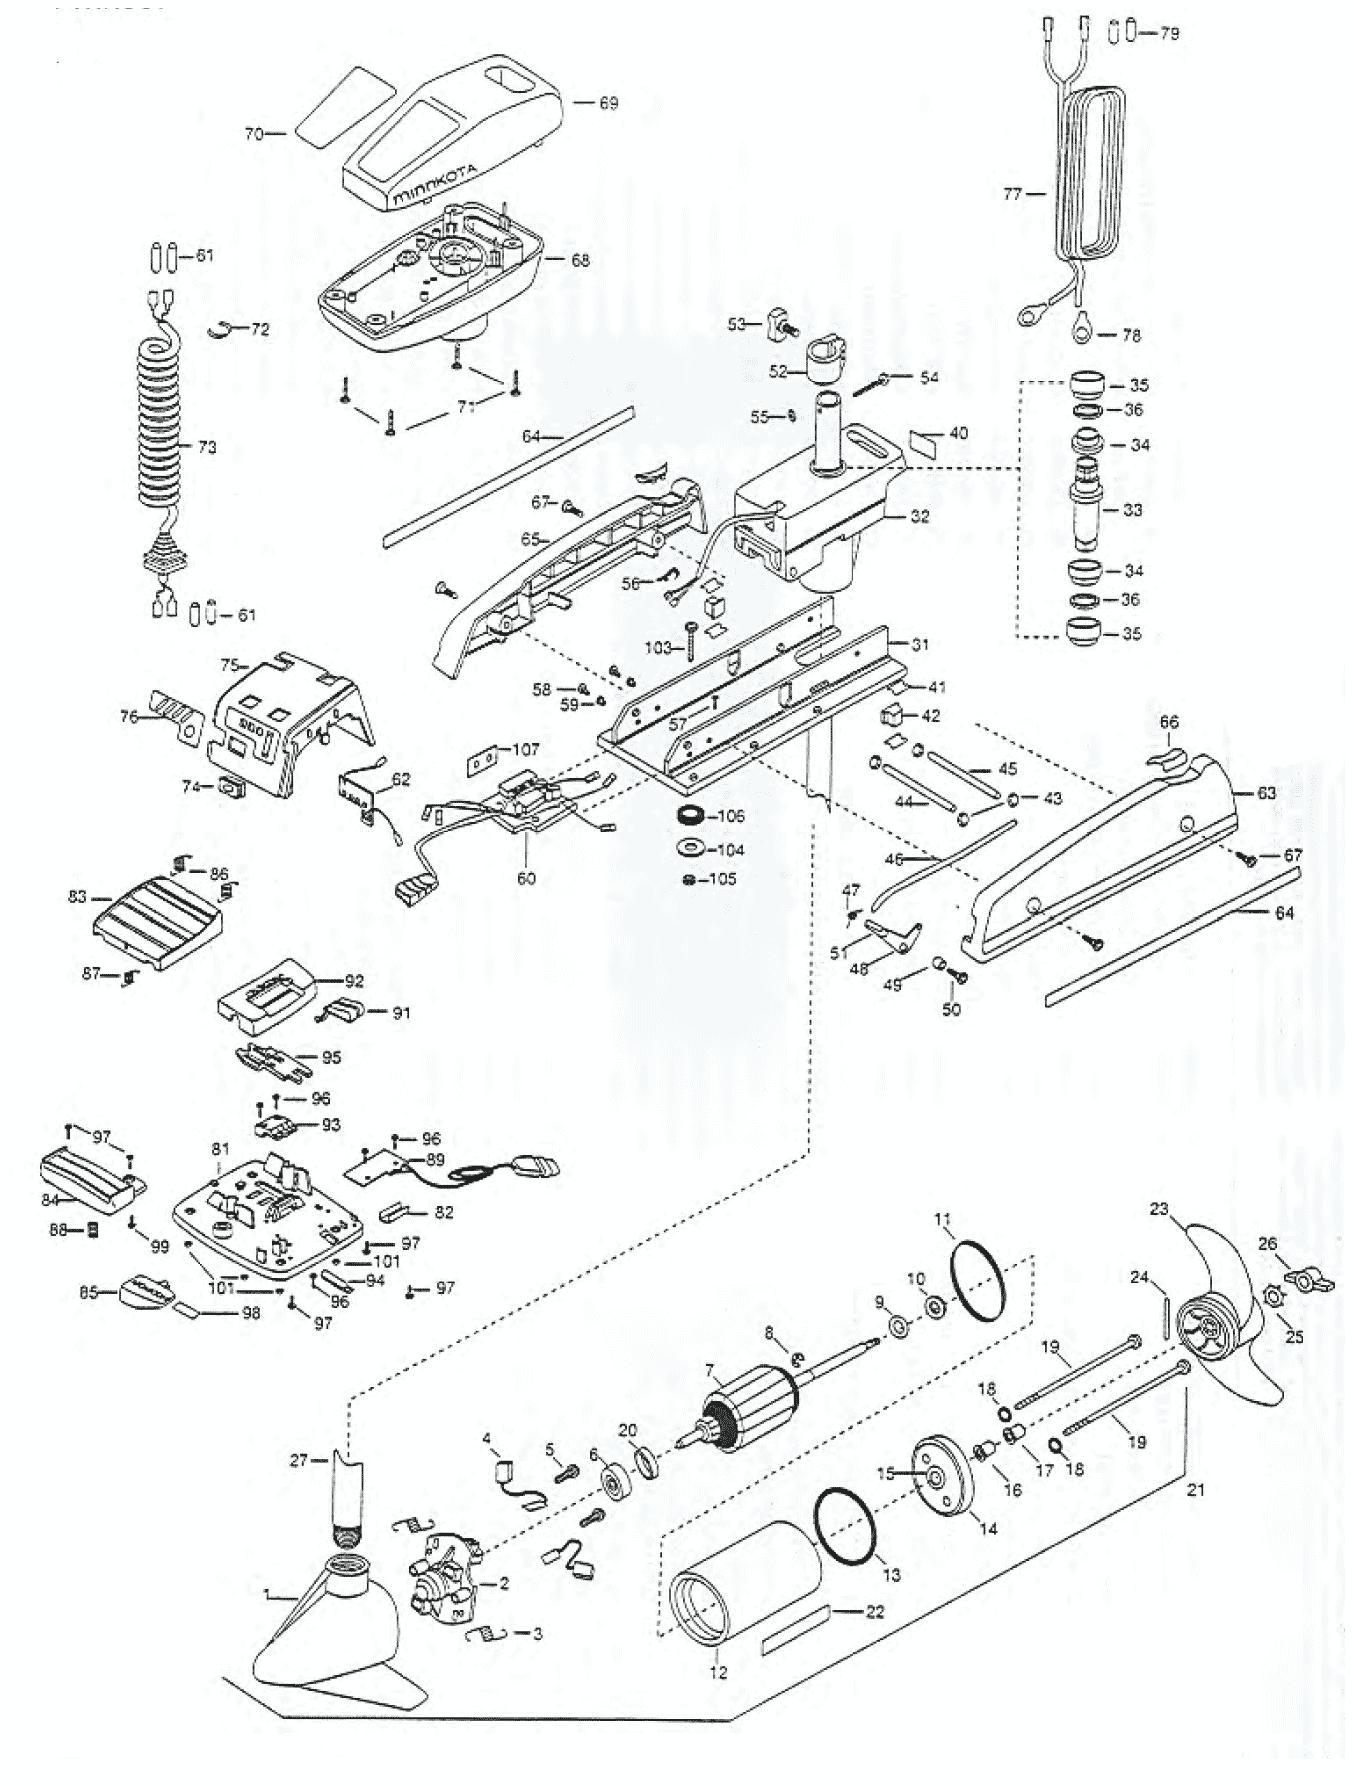 minn kota fortrex 80 parts diagram mazda b2200 radio wiring powerdrive 52 pro 54 inch 2000 from